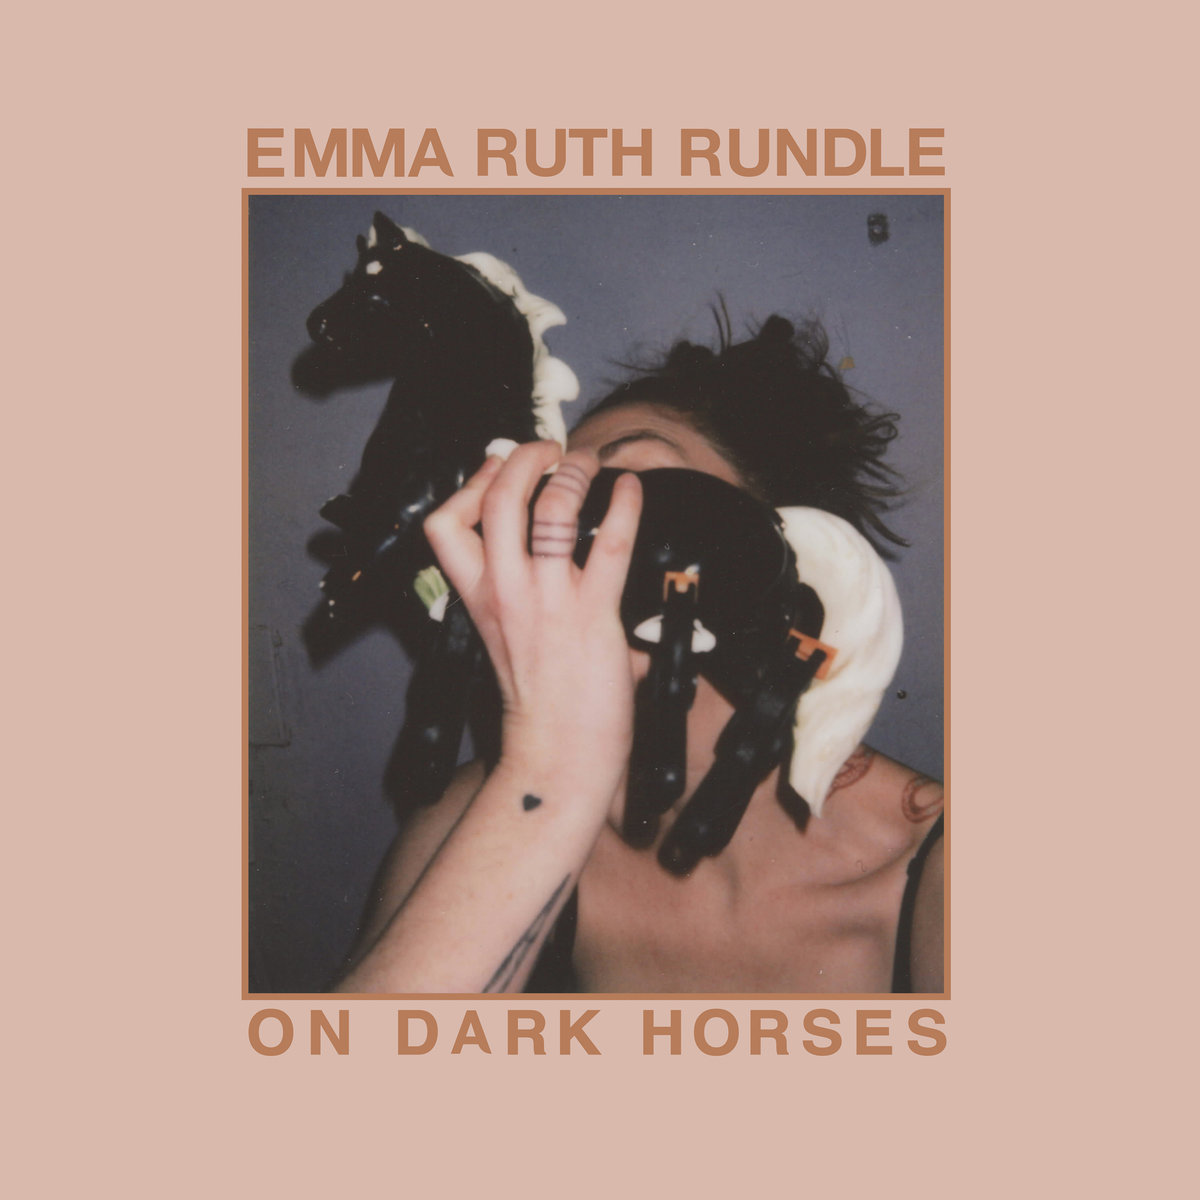 25. Emma Ruth Rundle - On Dark Horses